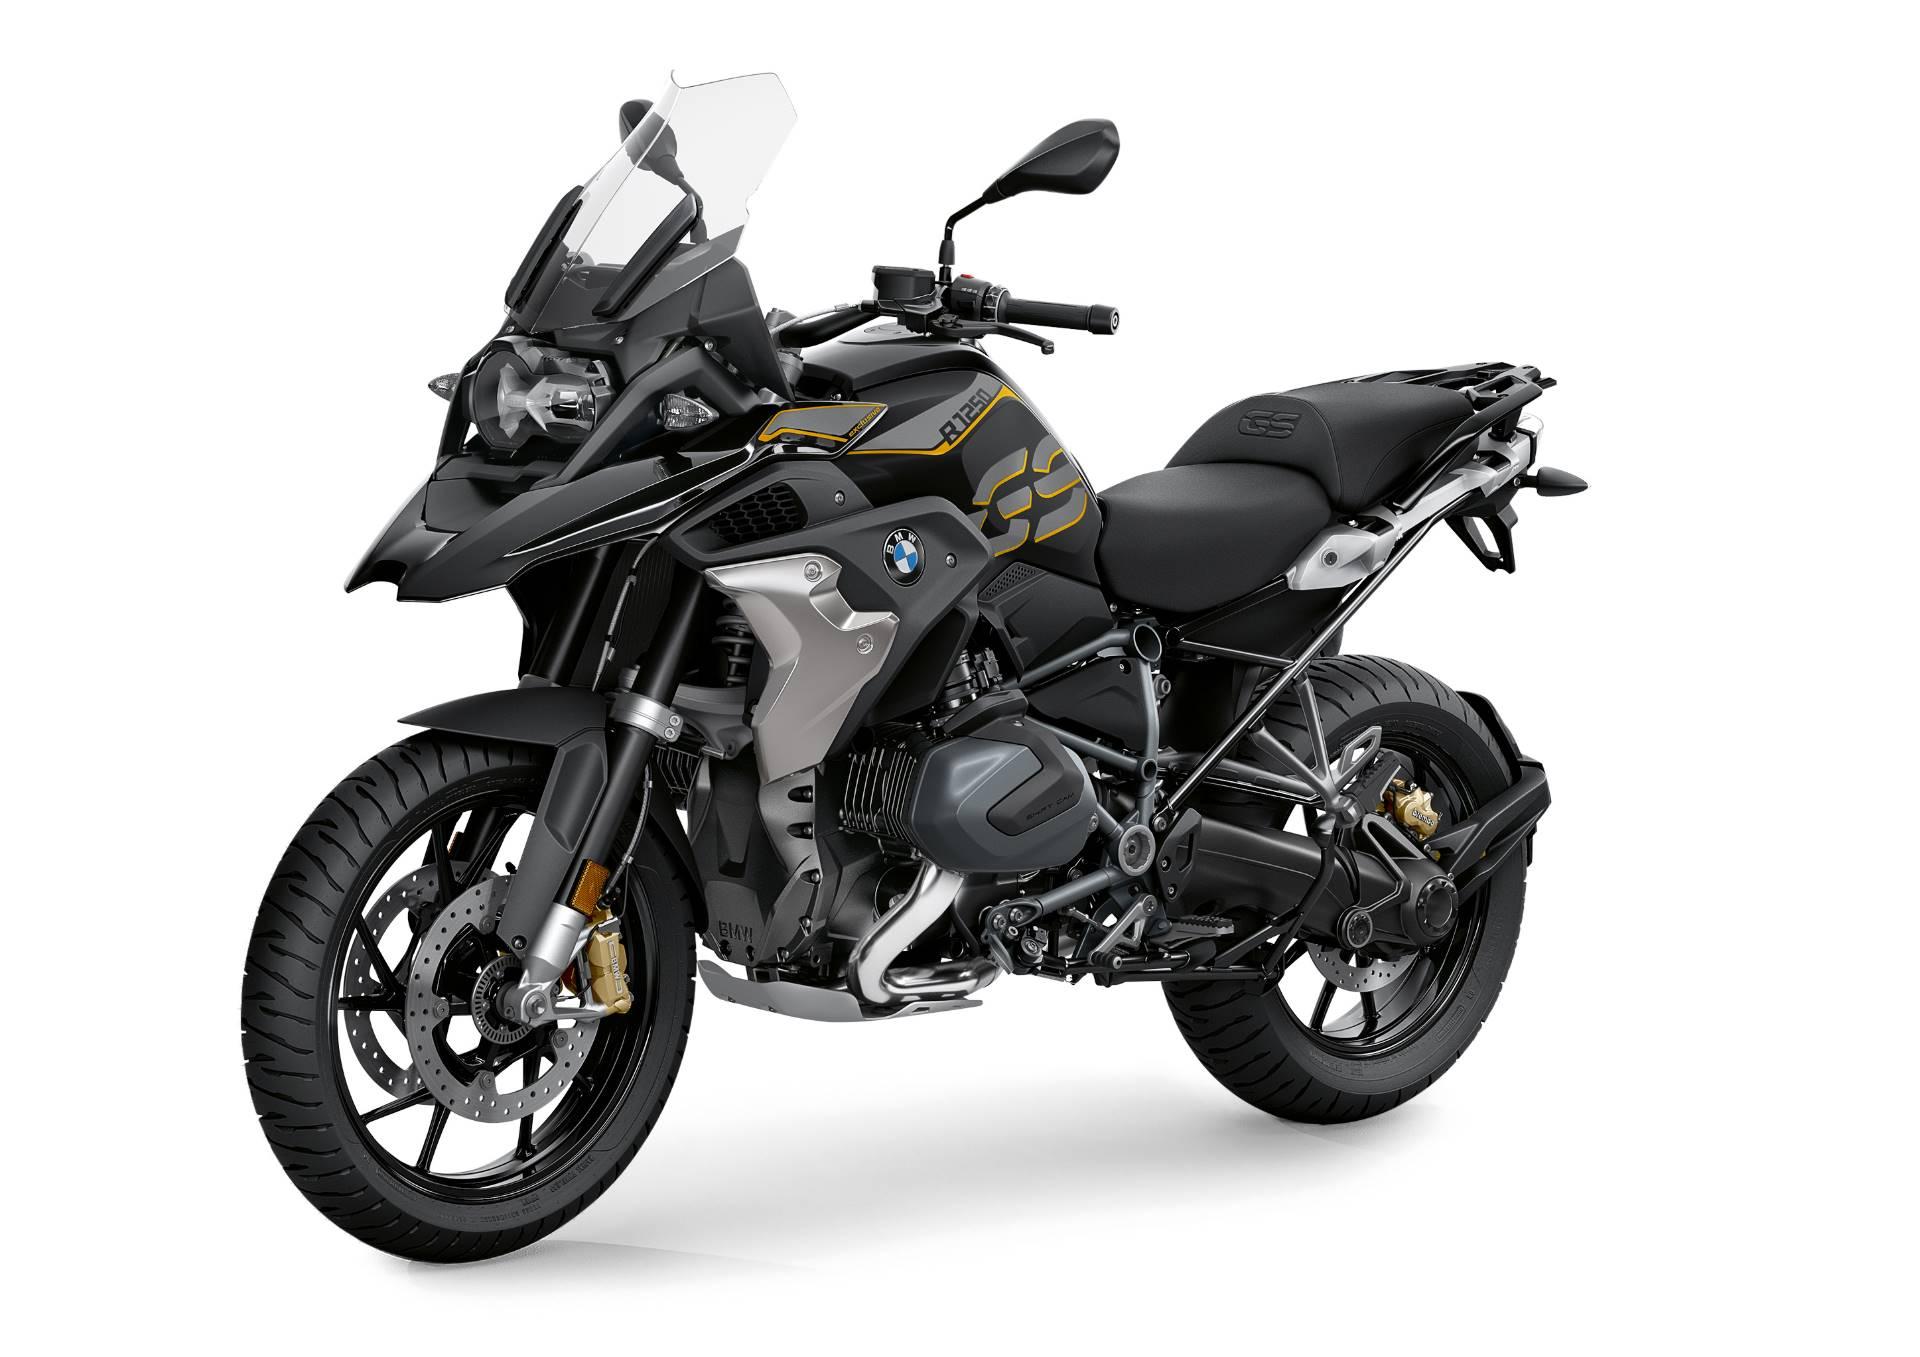 new 2019 bmw r 1250 gs motorcycles in miami fl rh motorcyclesofmiami com